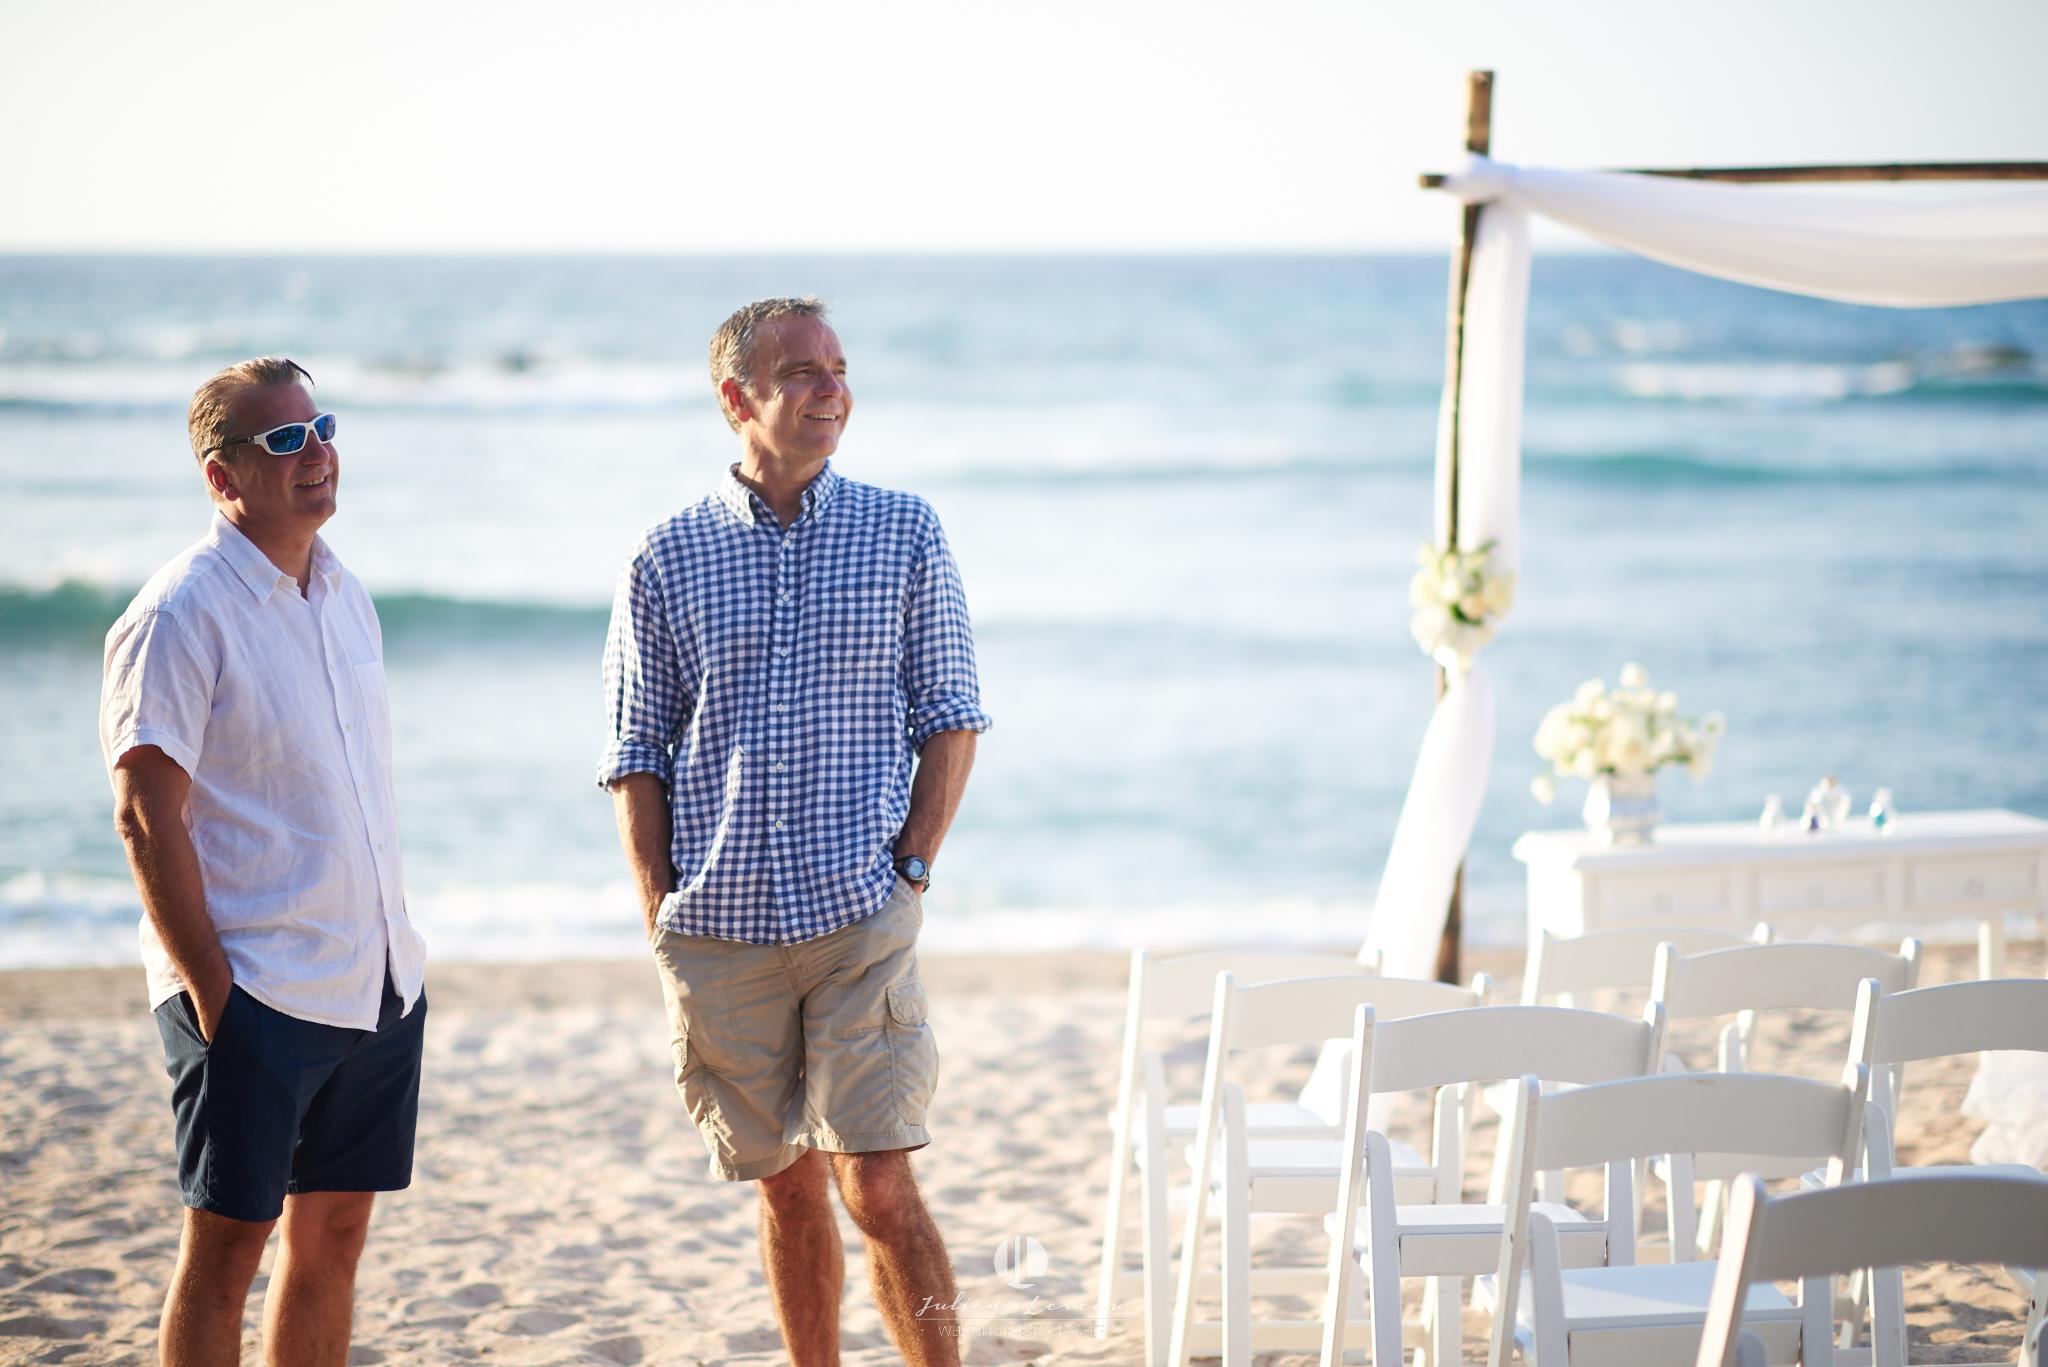 Punta Mita photographer - wedding at the beach club setting